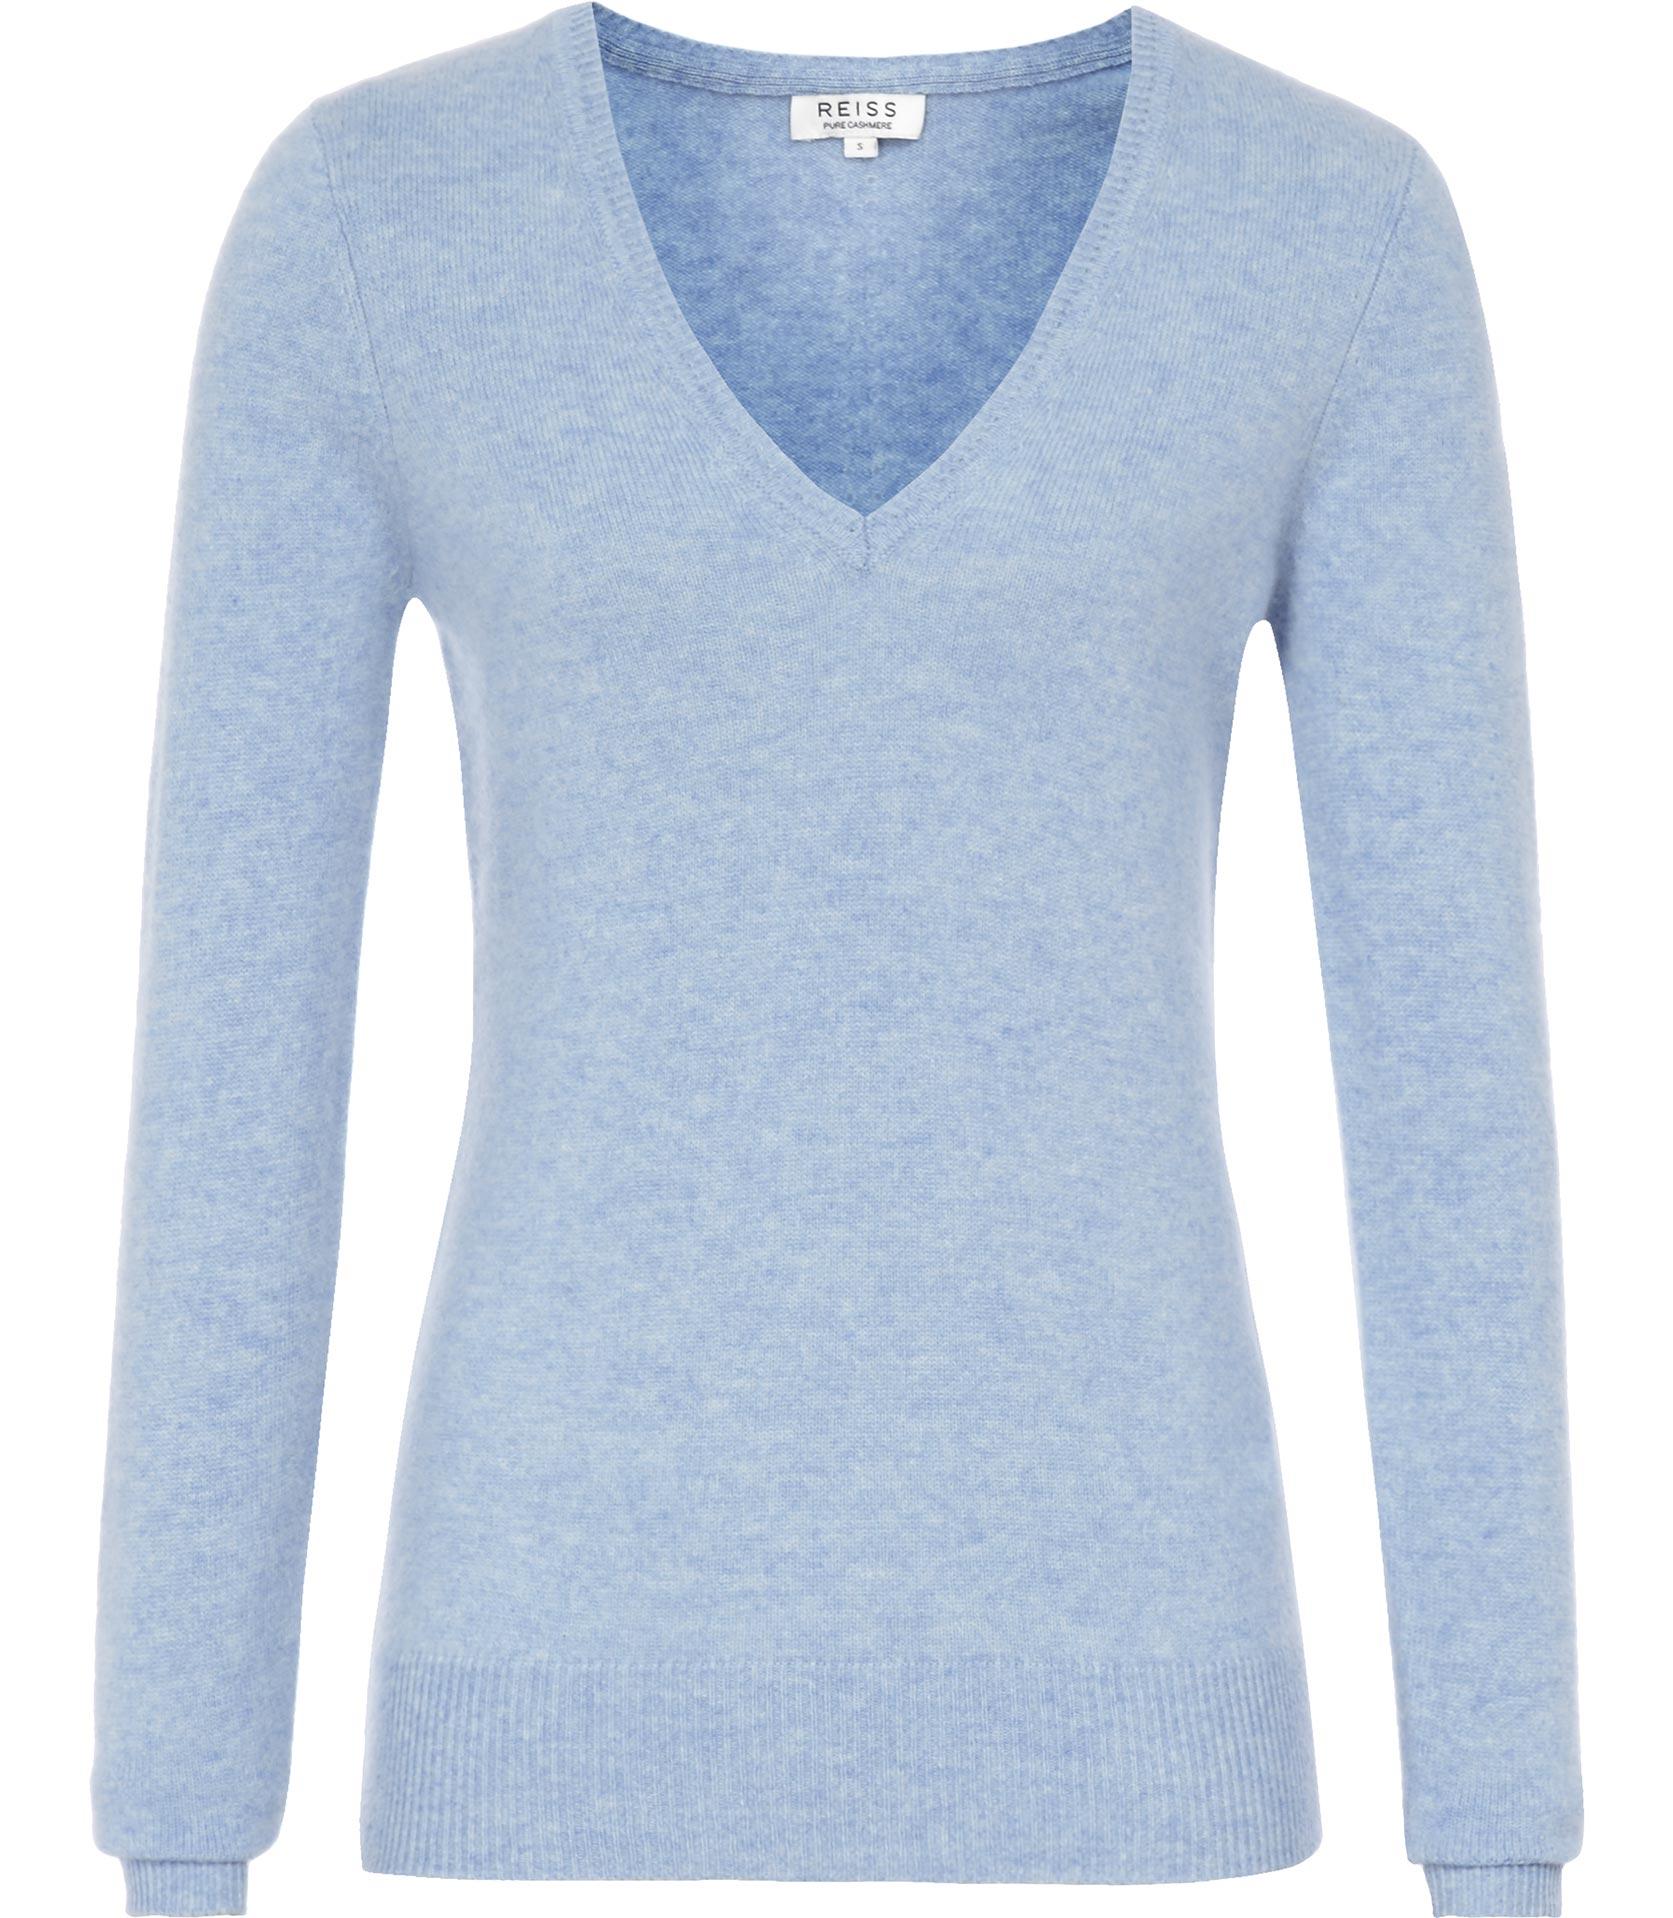 Reiss Mera Cashmere V Neck Jumper in Blue | Lyst